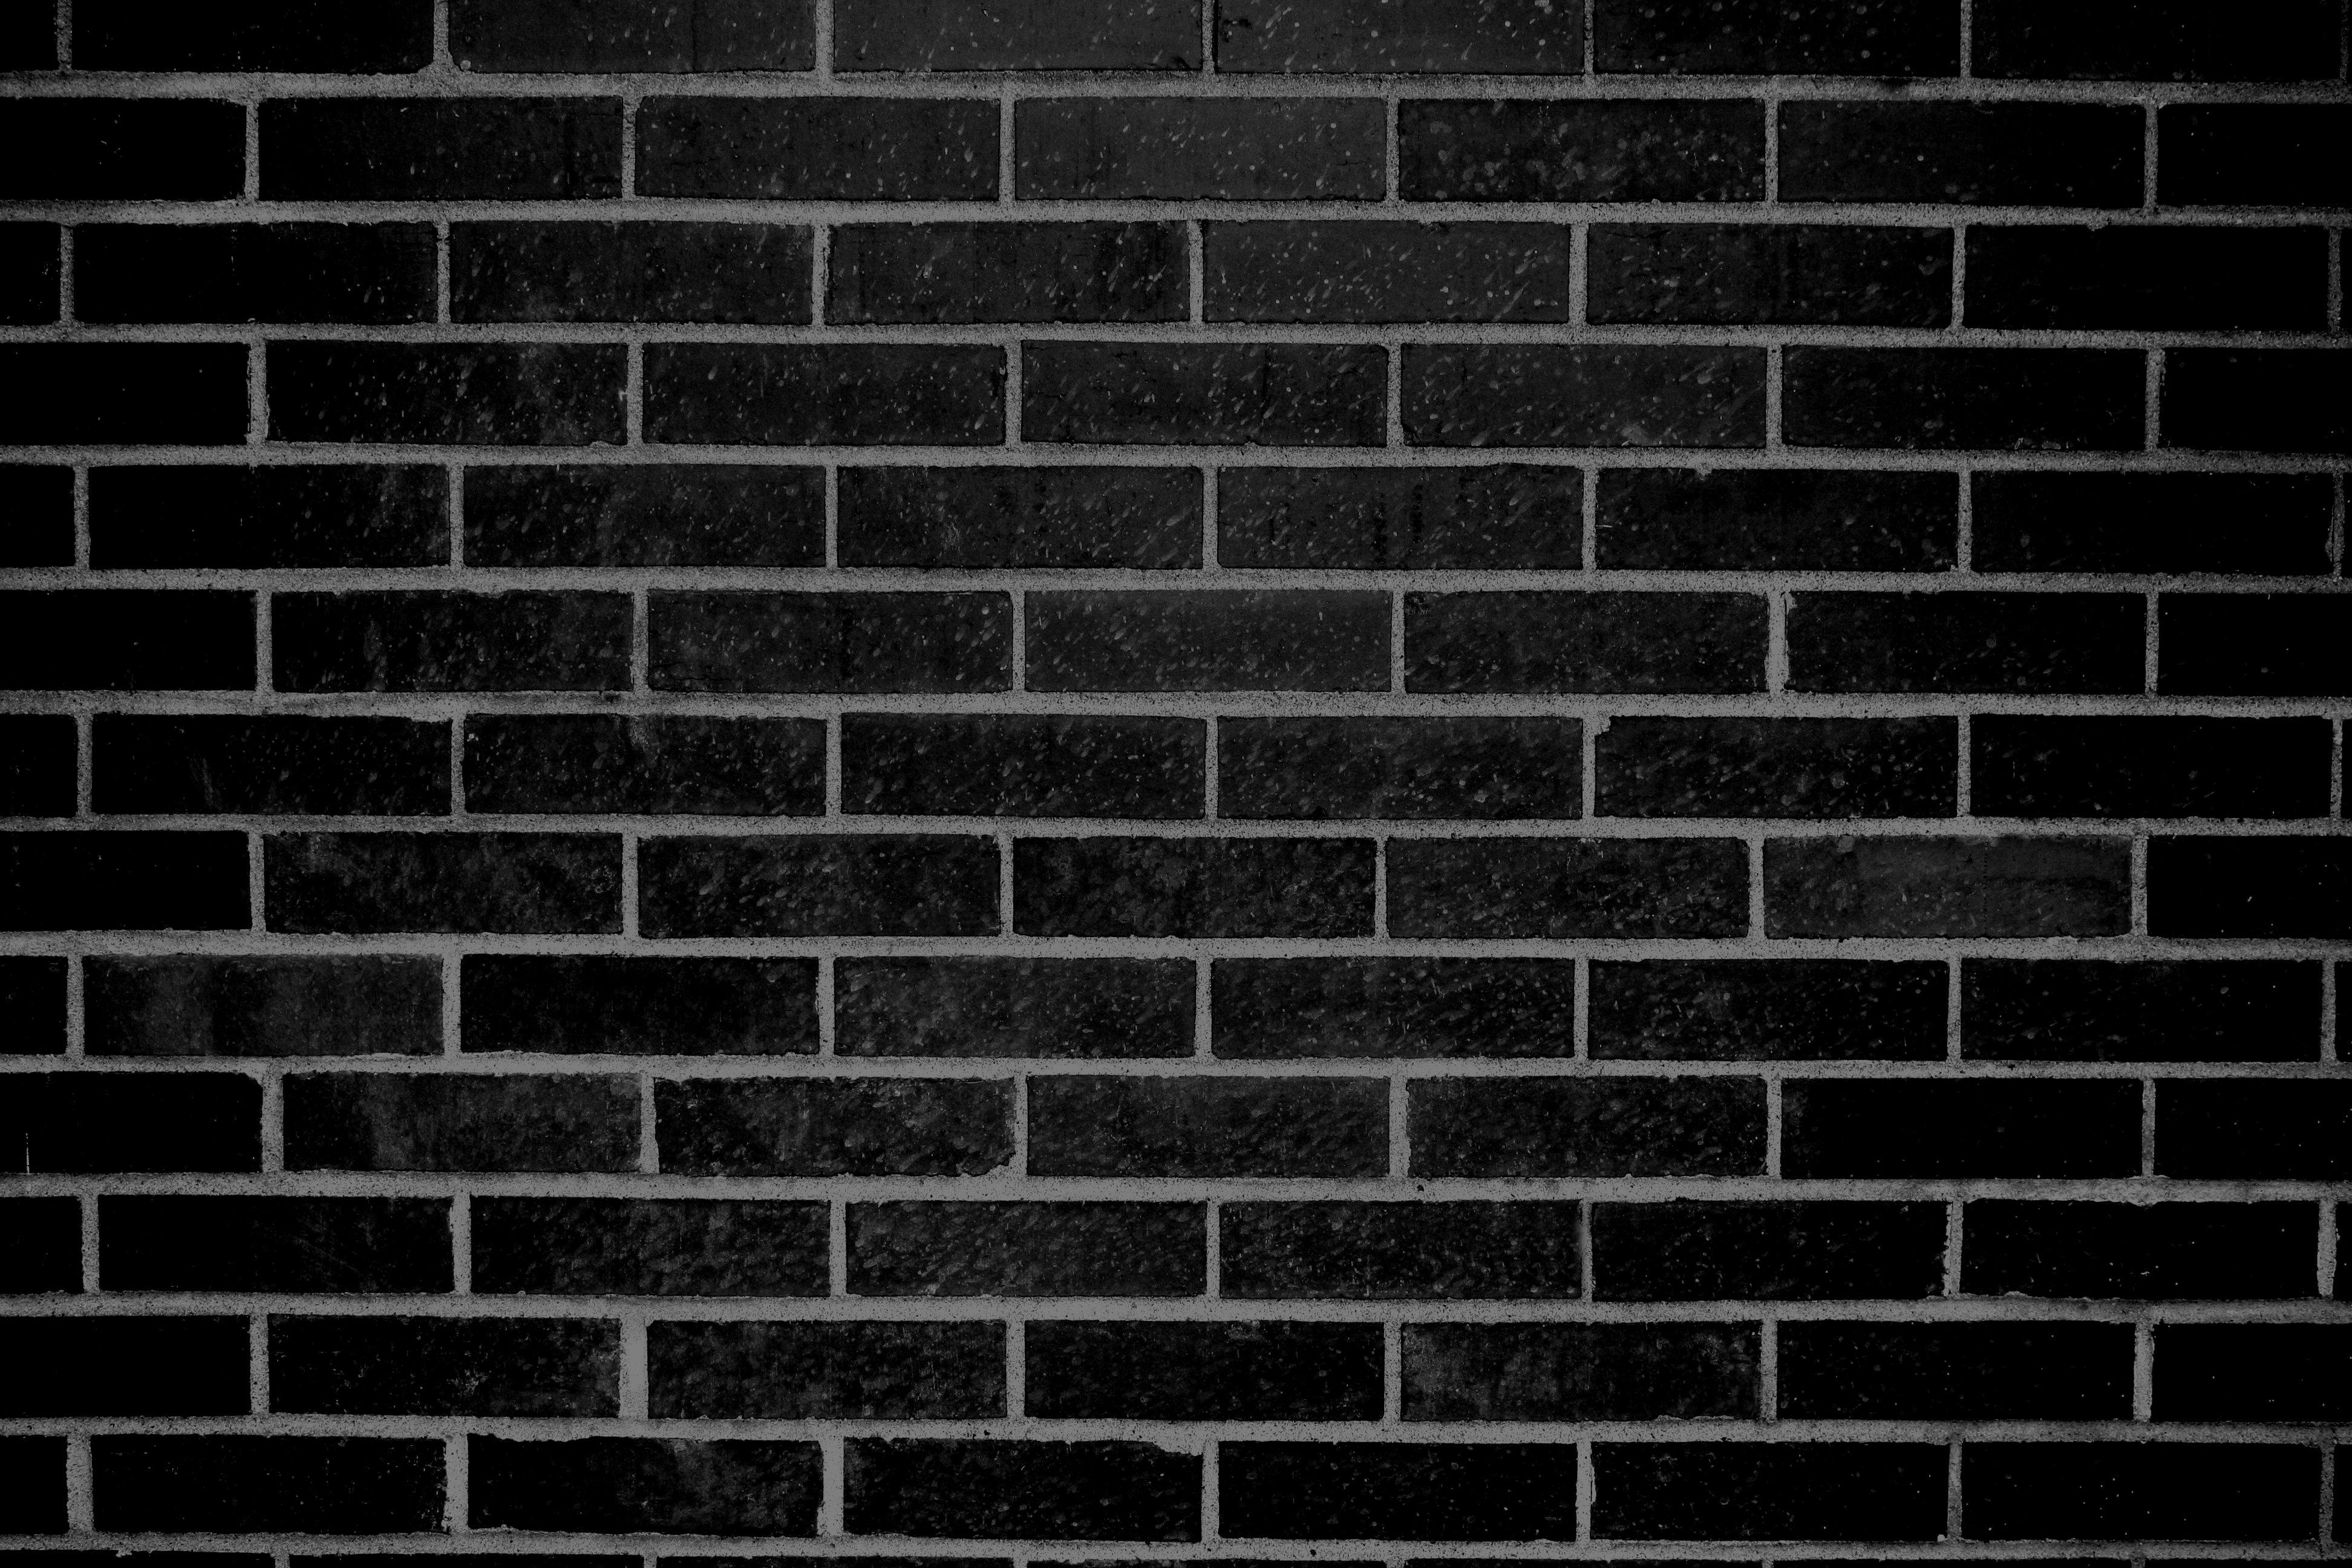 Black clipart brick wall Home Brick Home Tray brick